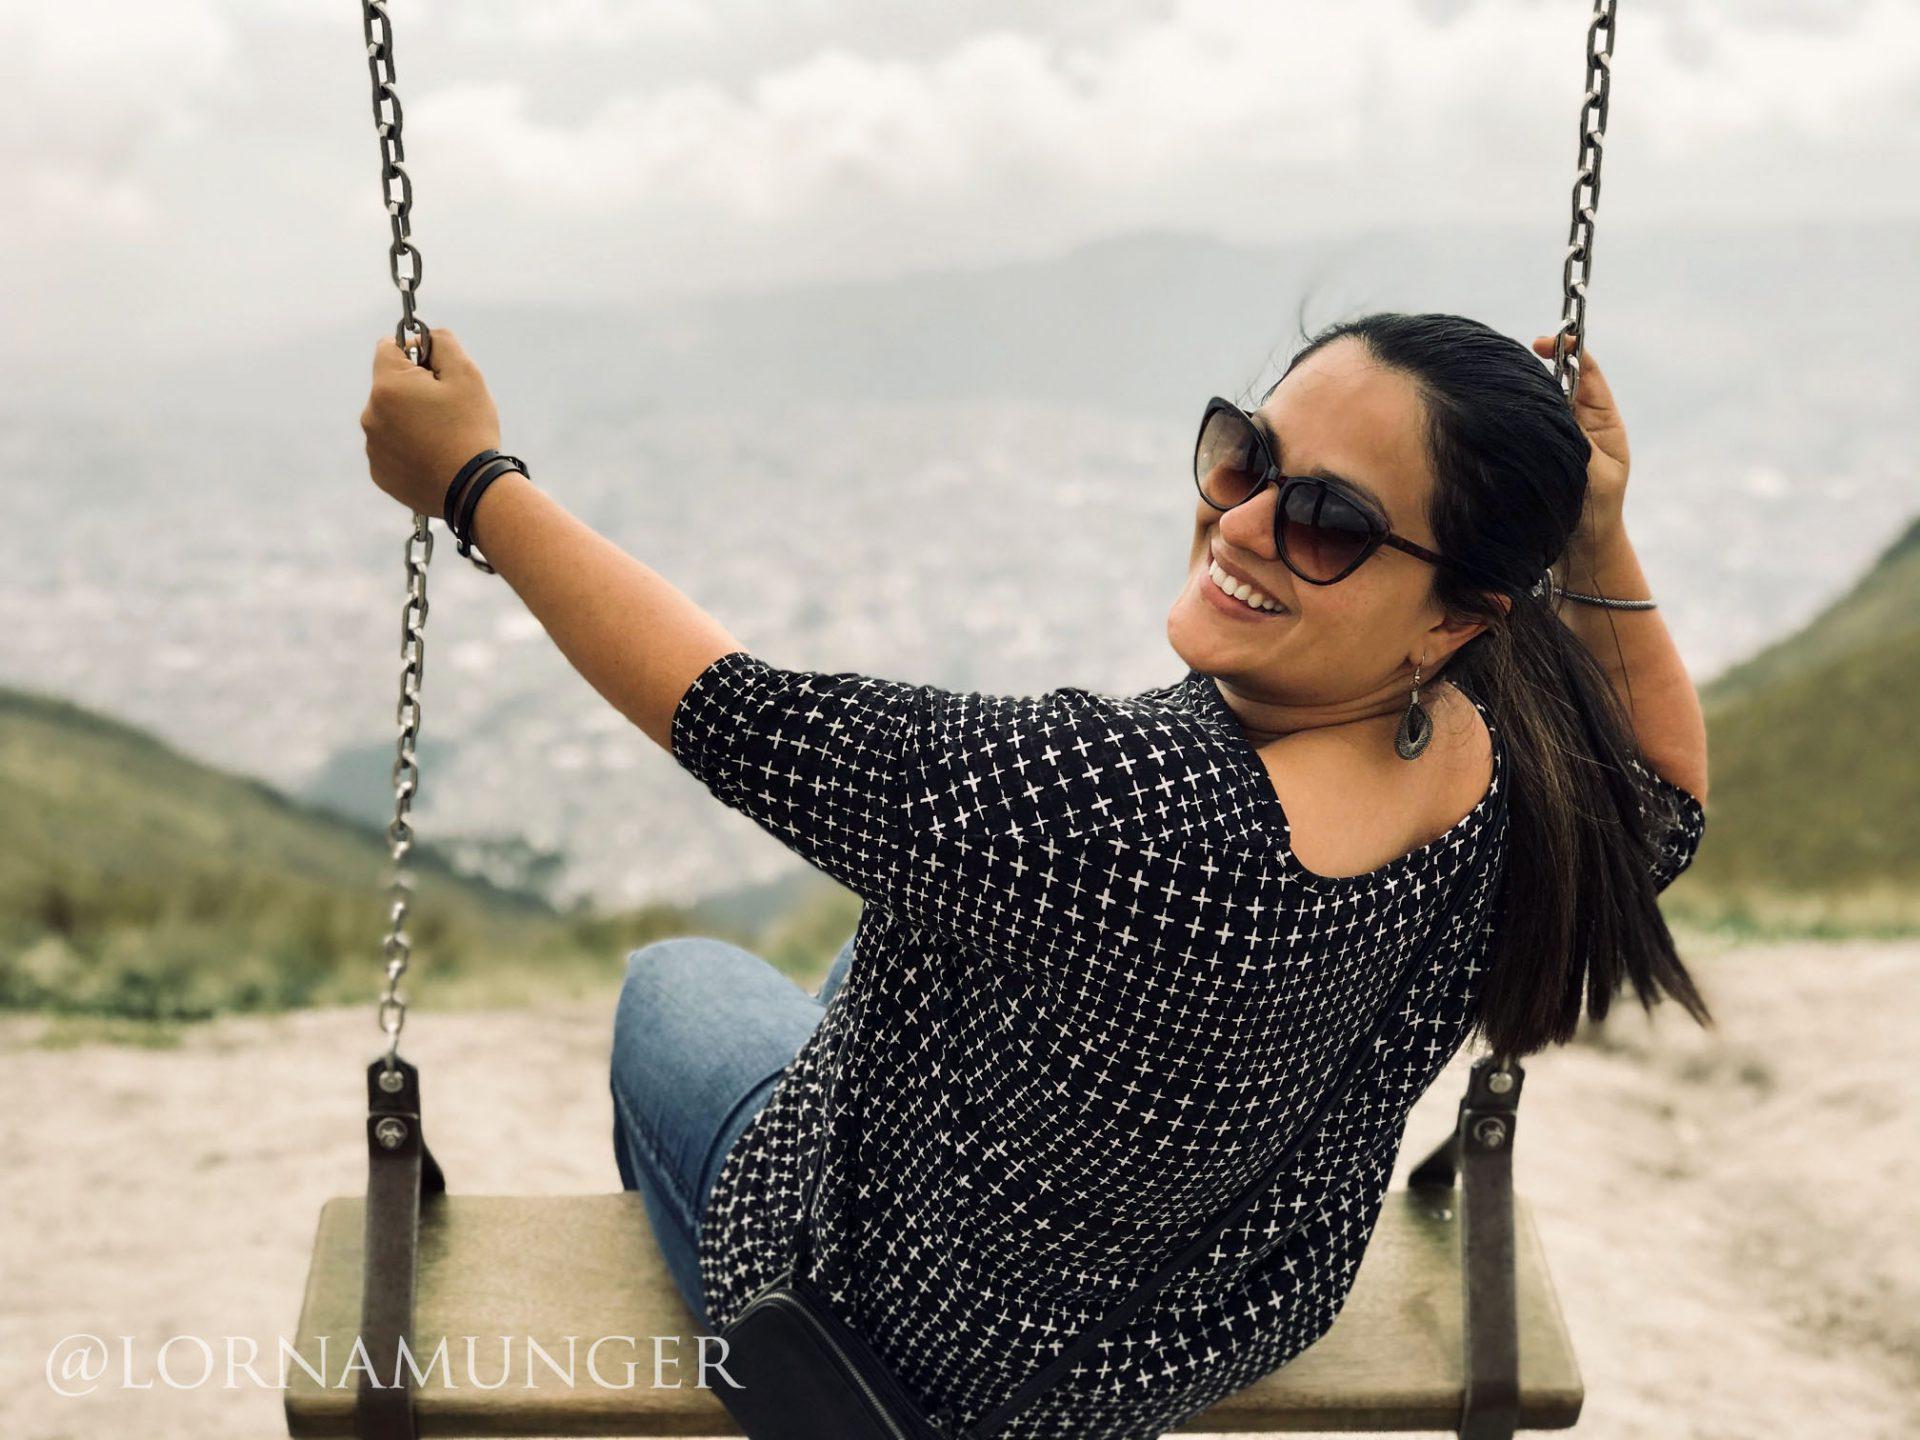 Lady Smiles on Swing in Ecuador | prodigalpieces.com